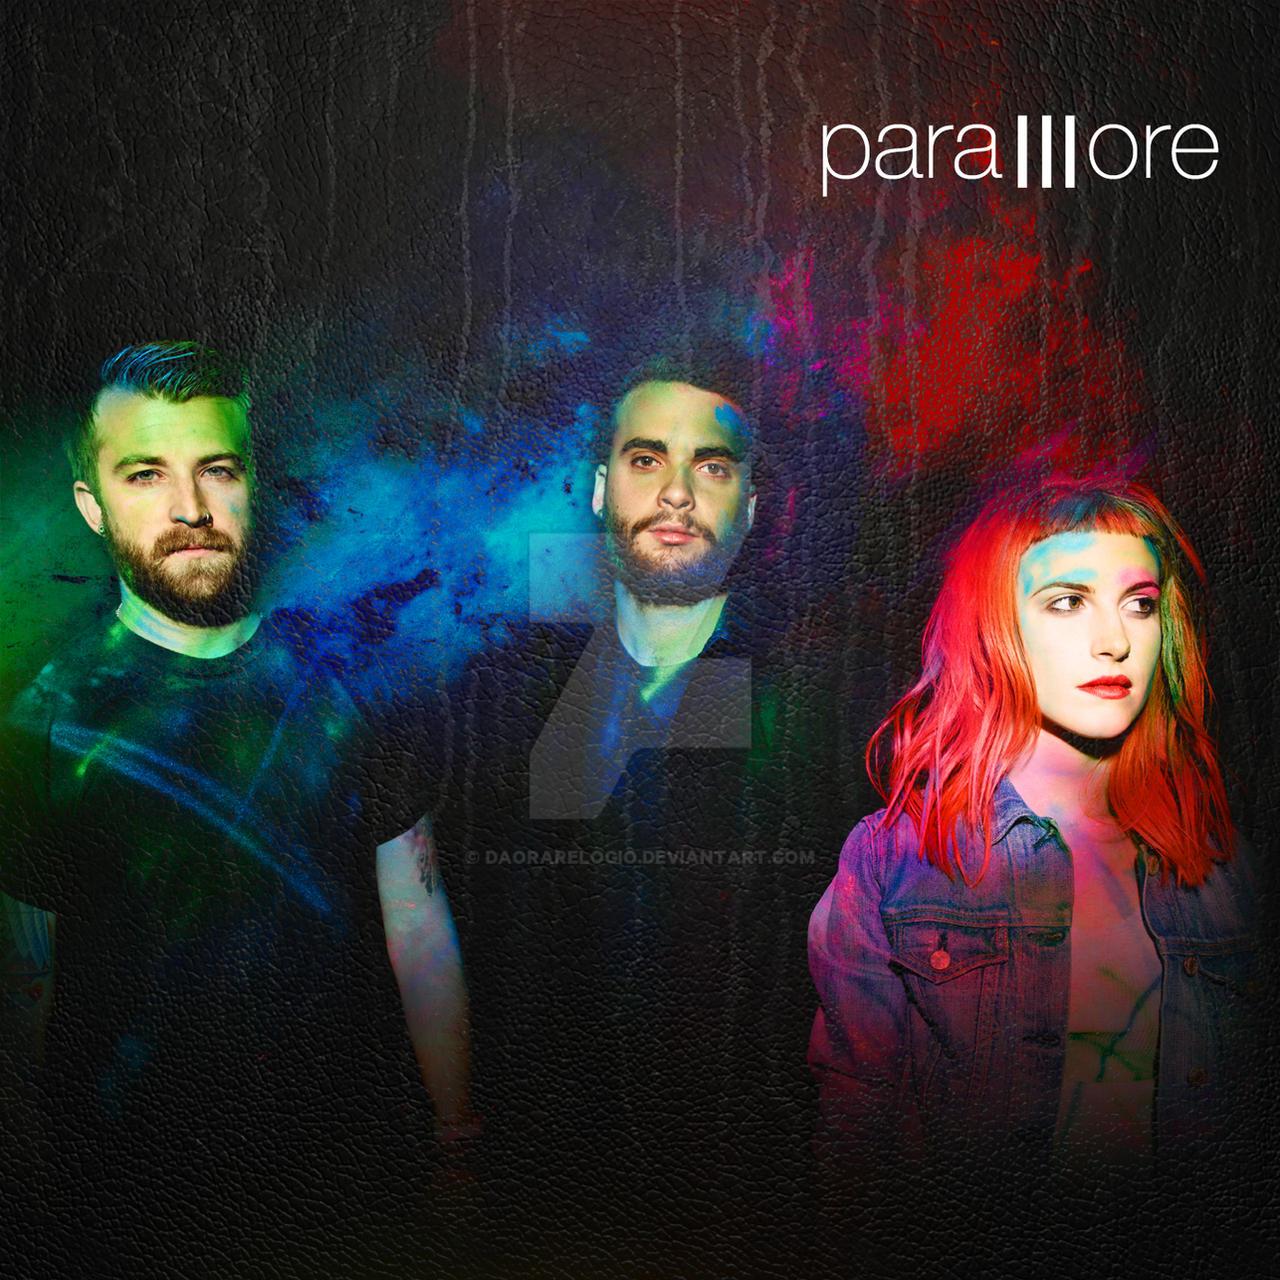 Paramore Album Cover by daorarelogio on DeviantArt Paramore 013